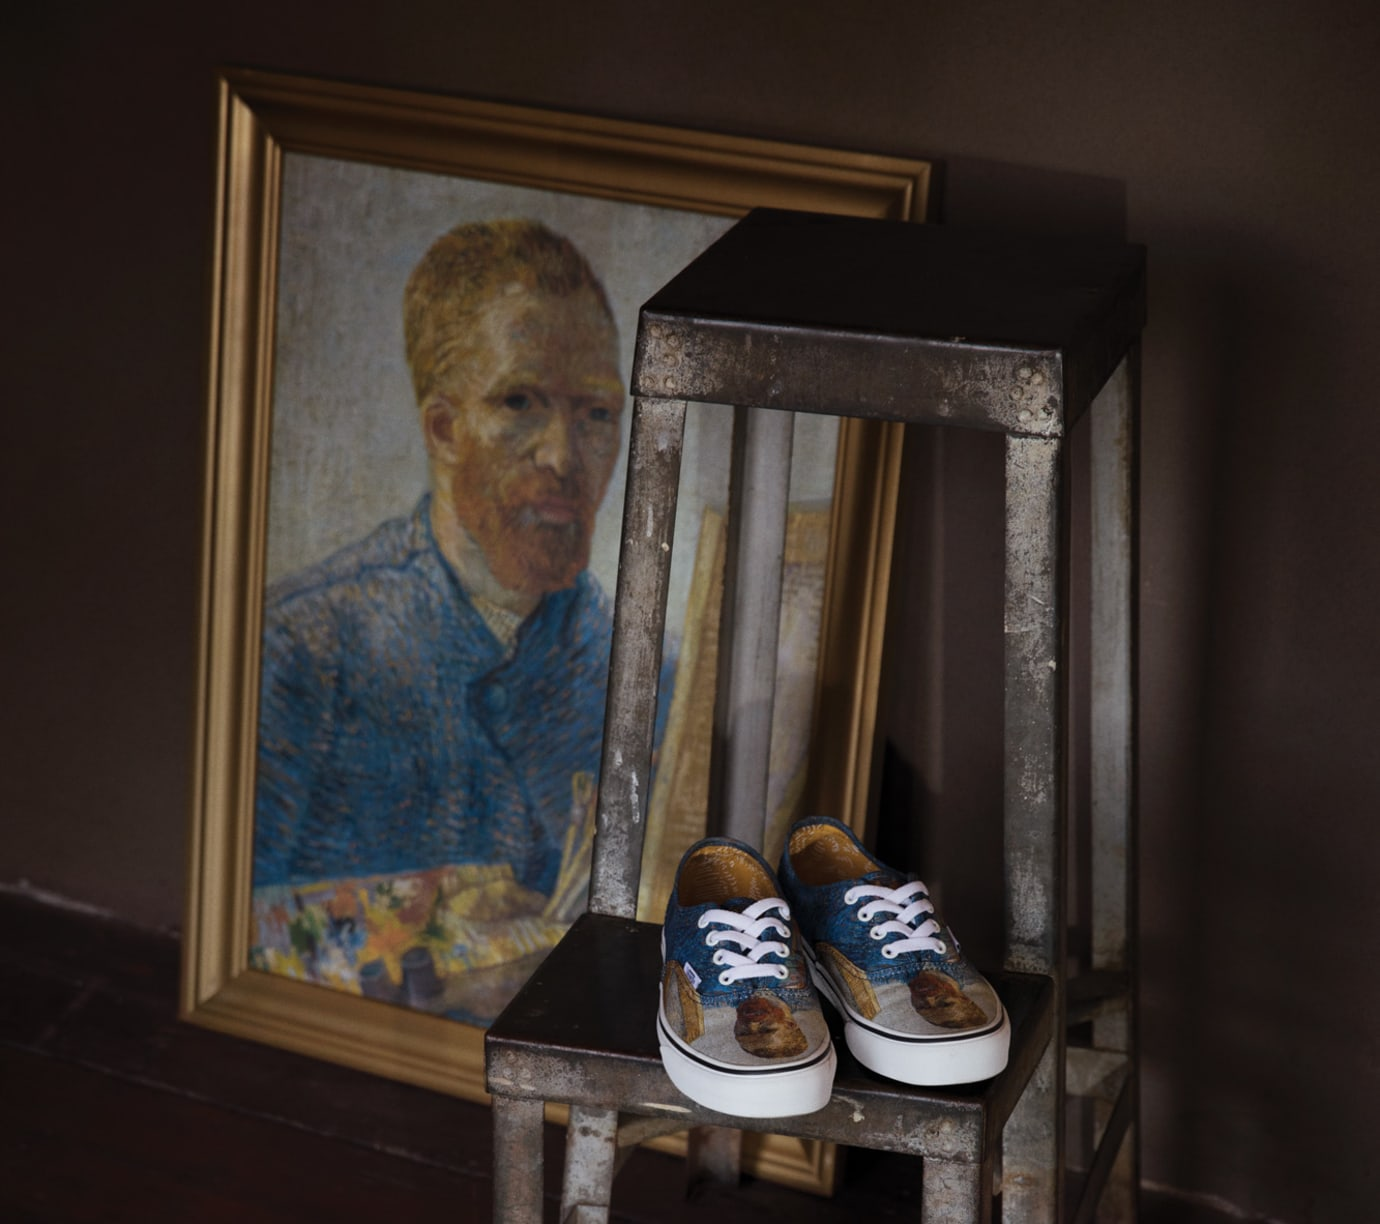 Van Gogh Museum x Vans Collection Release Date  3d59afc2b